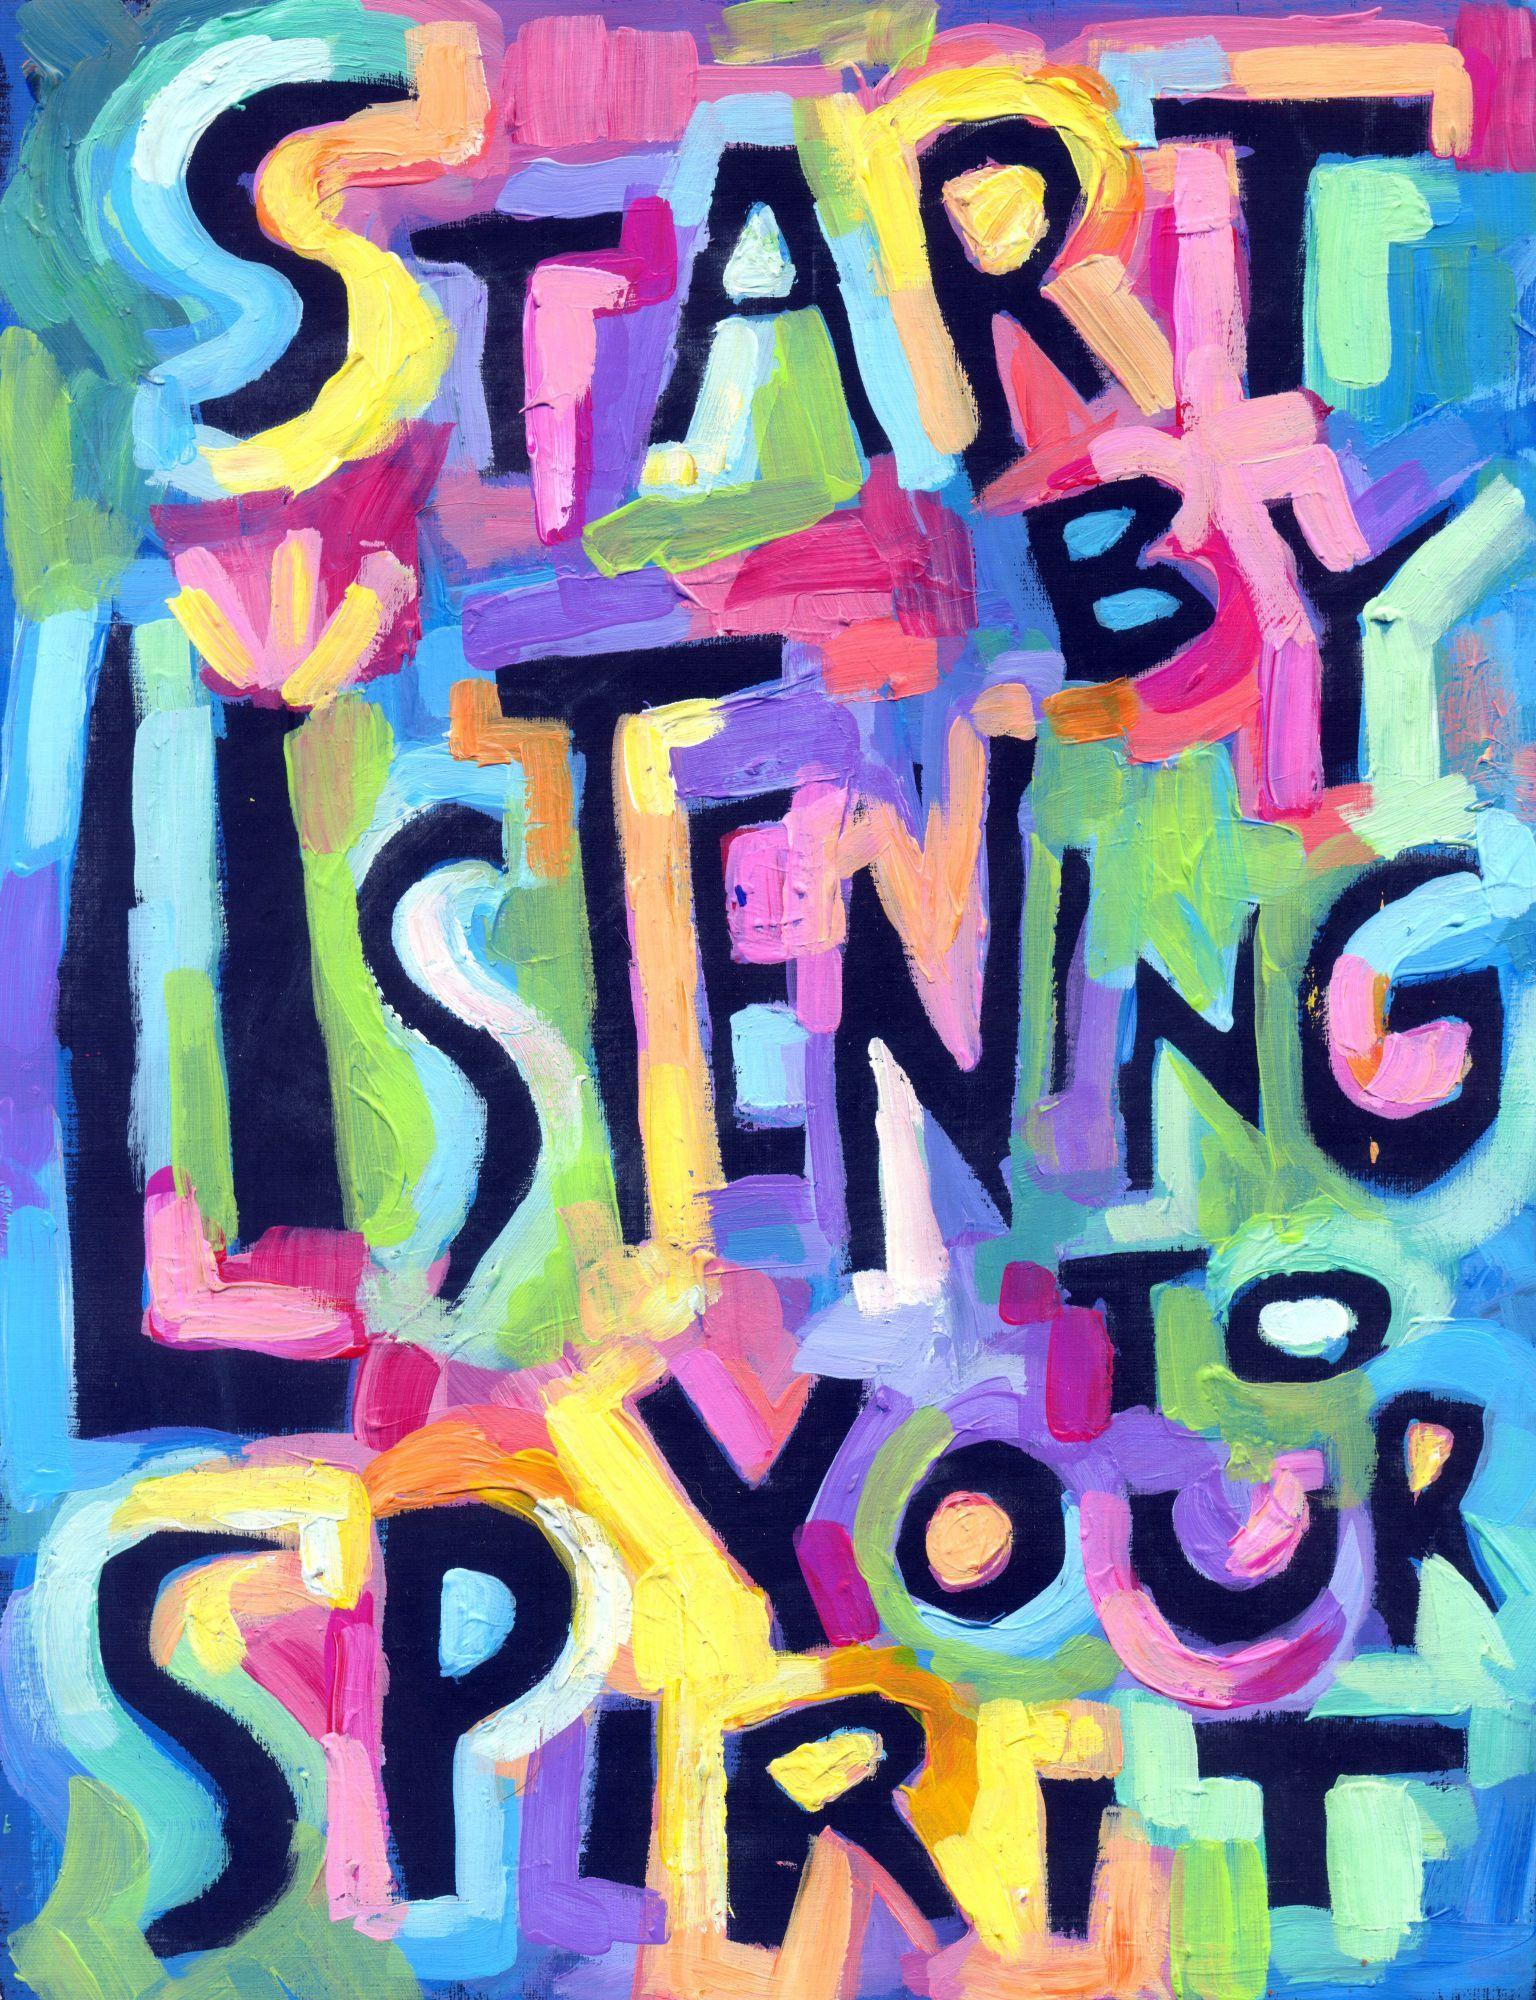 Start by listening to your spirit